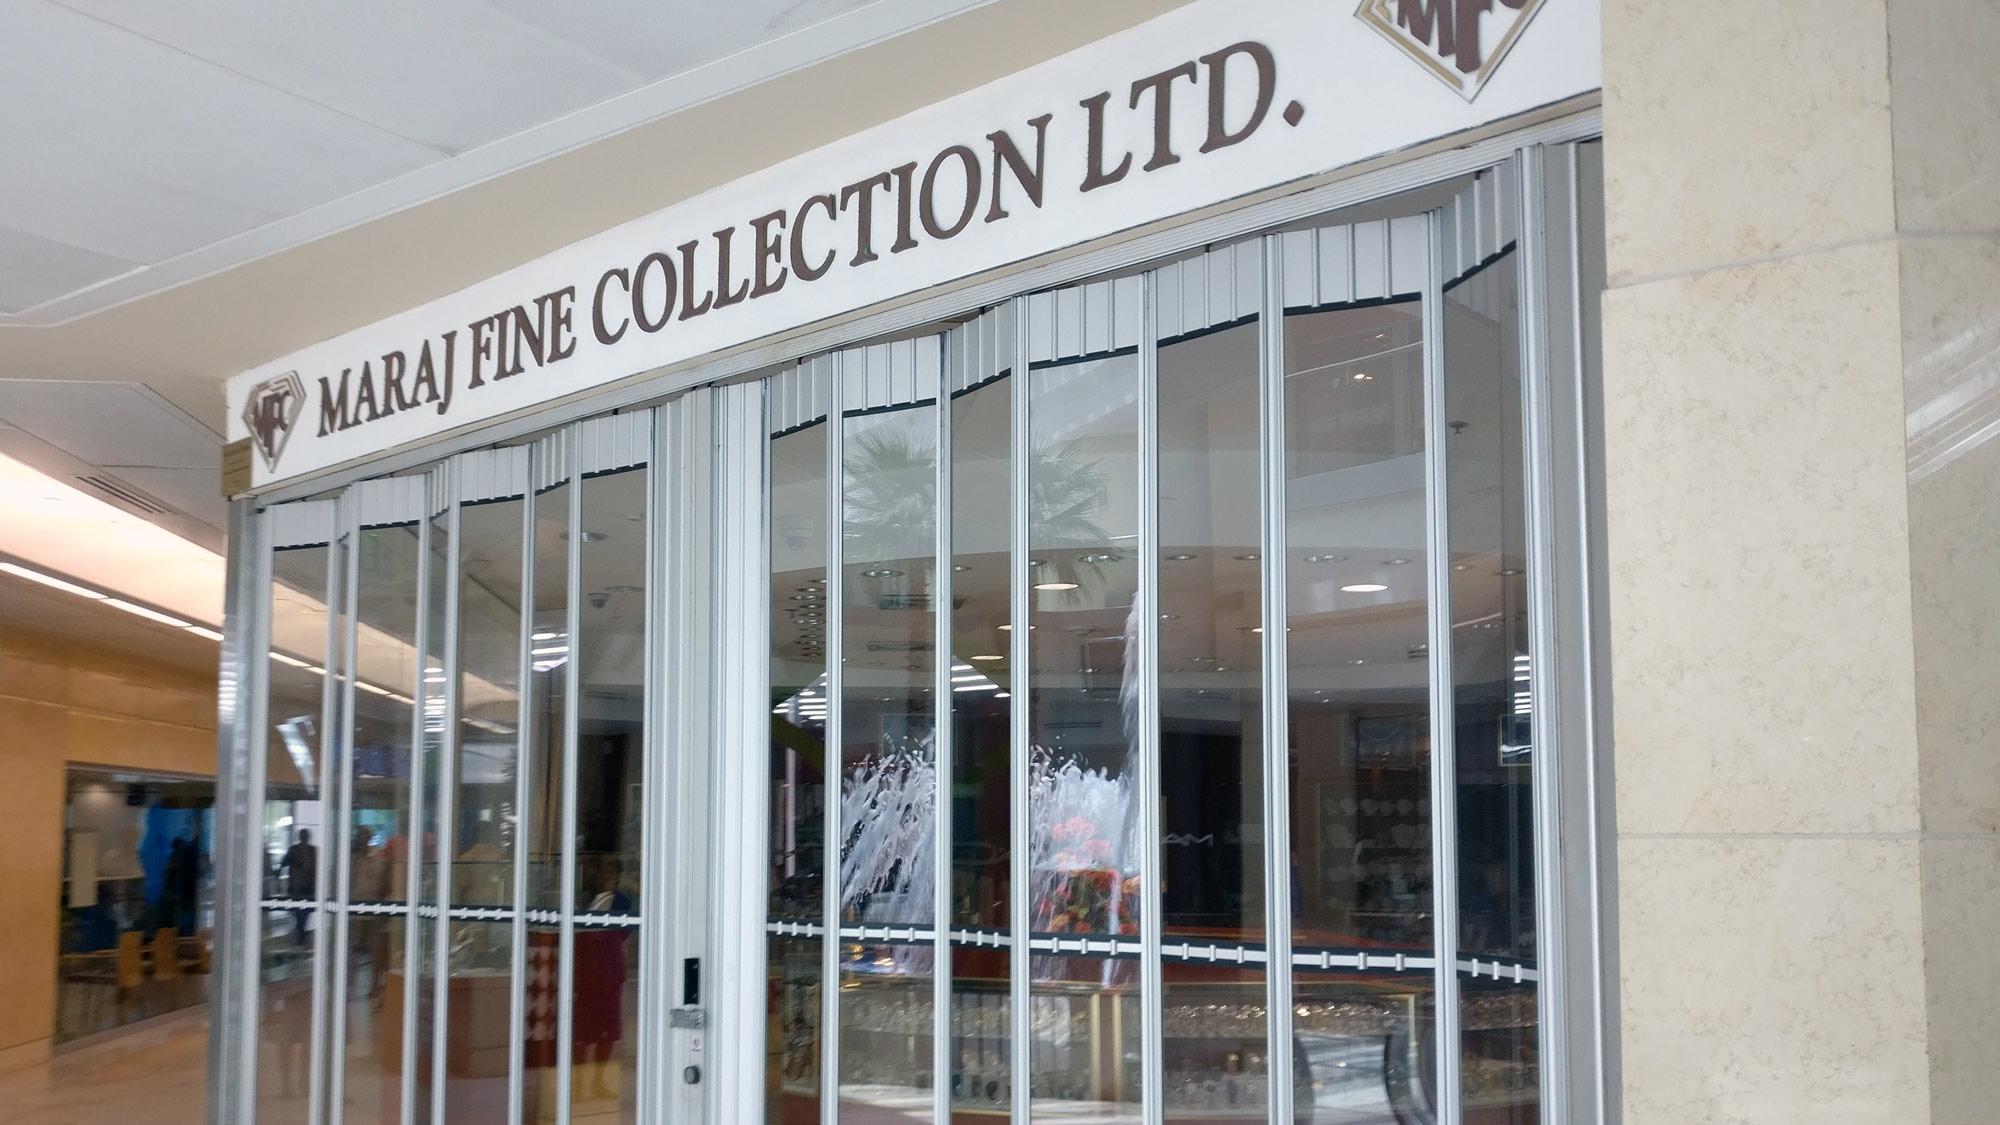 Maraj Fine Collecion